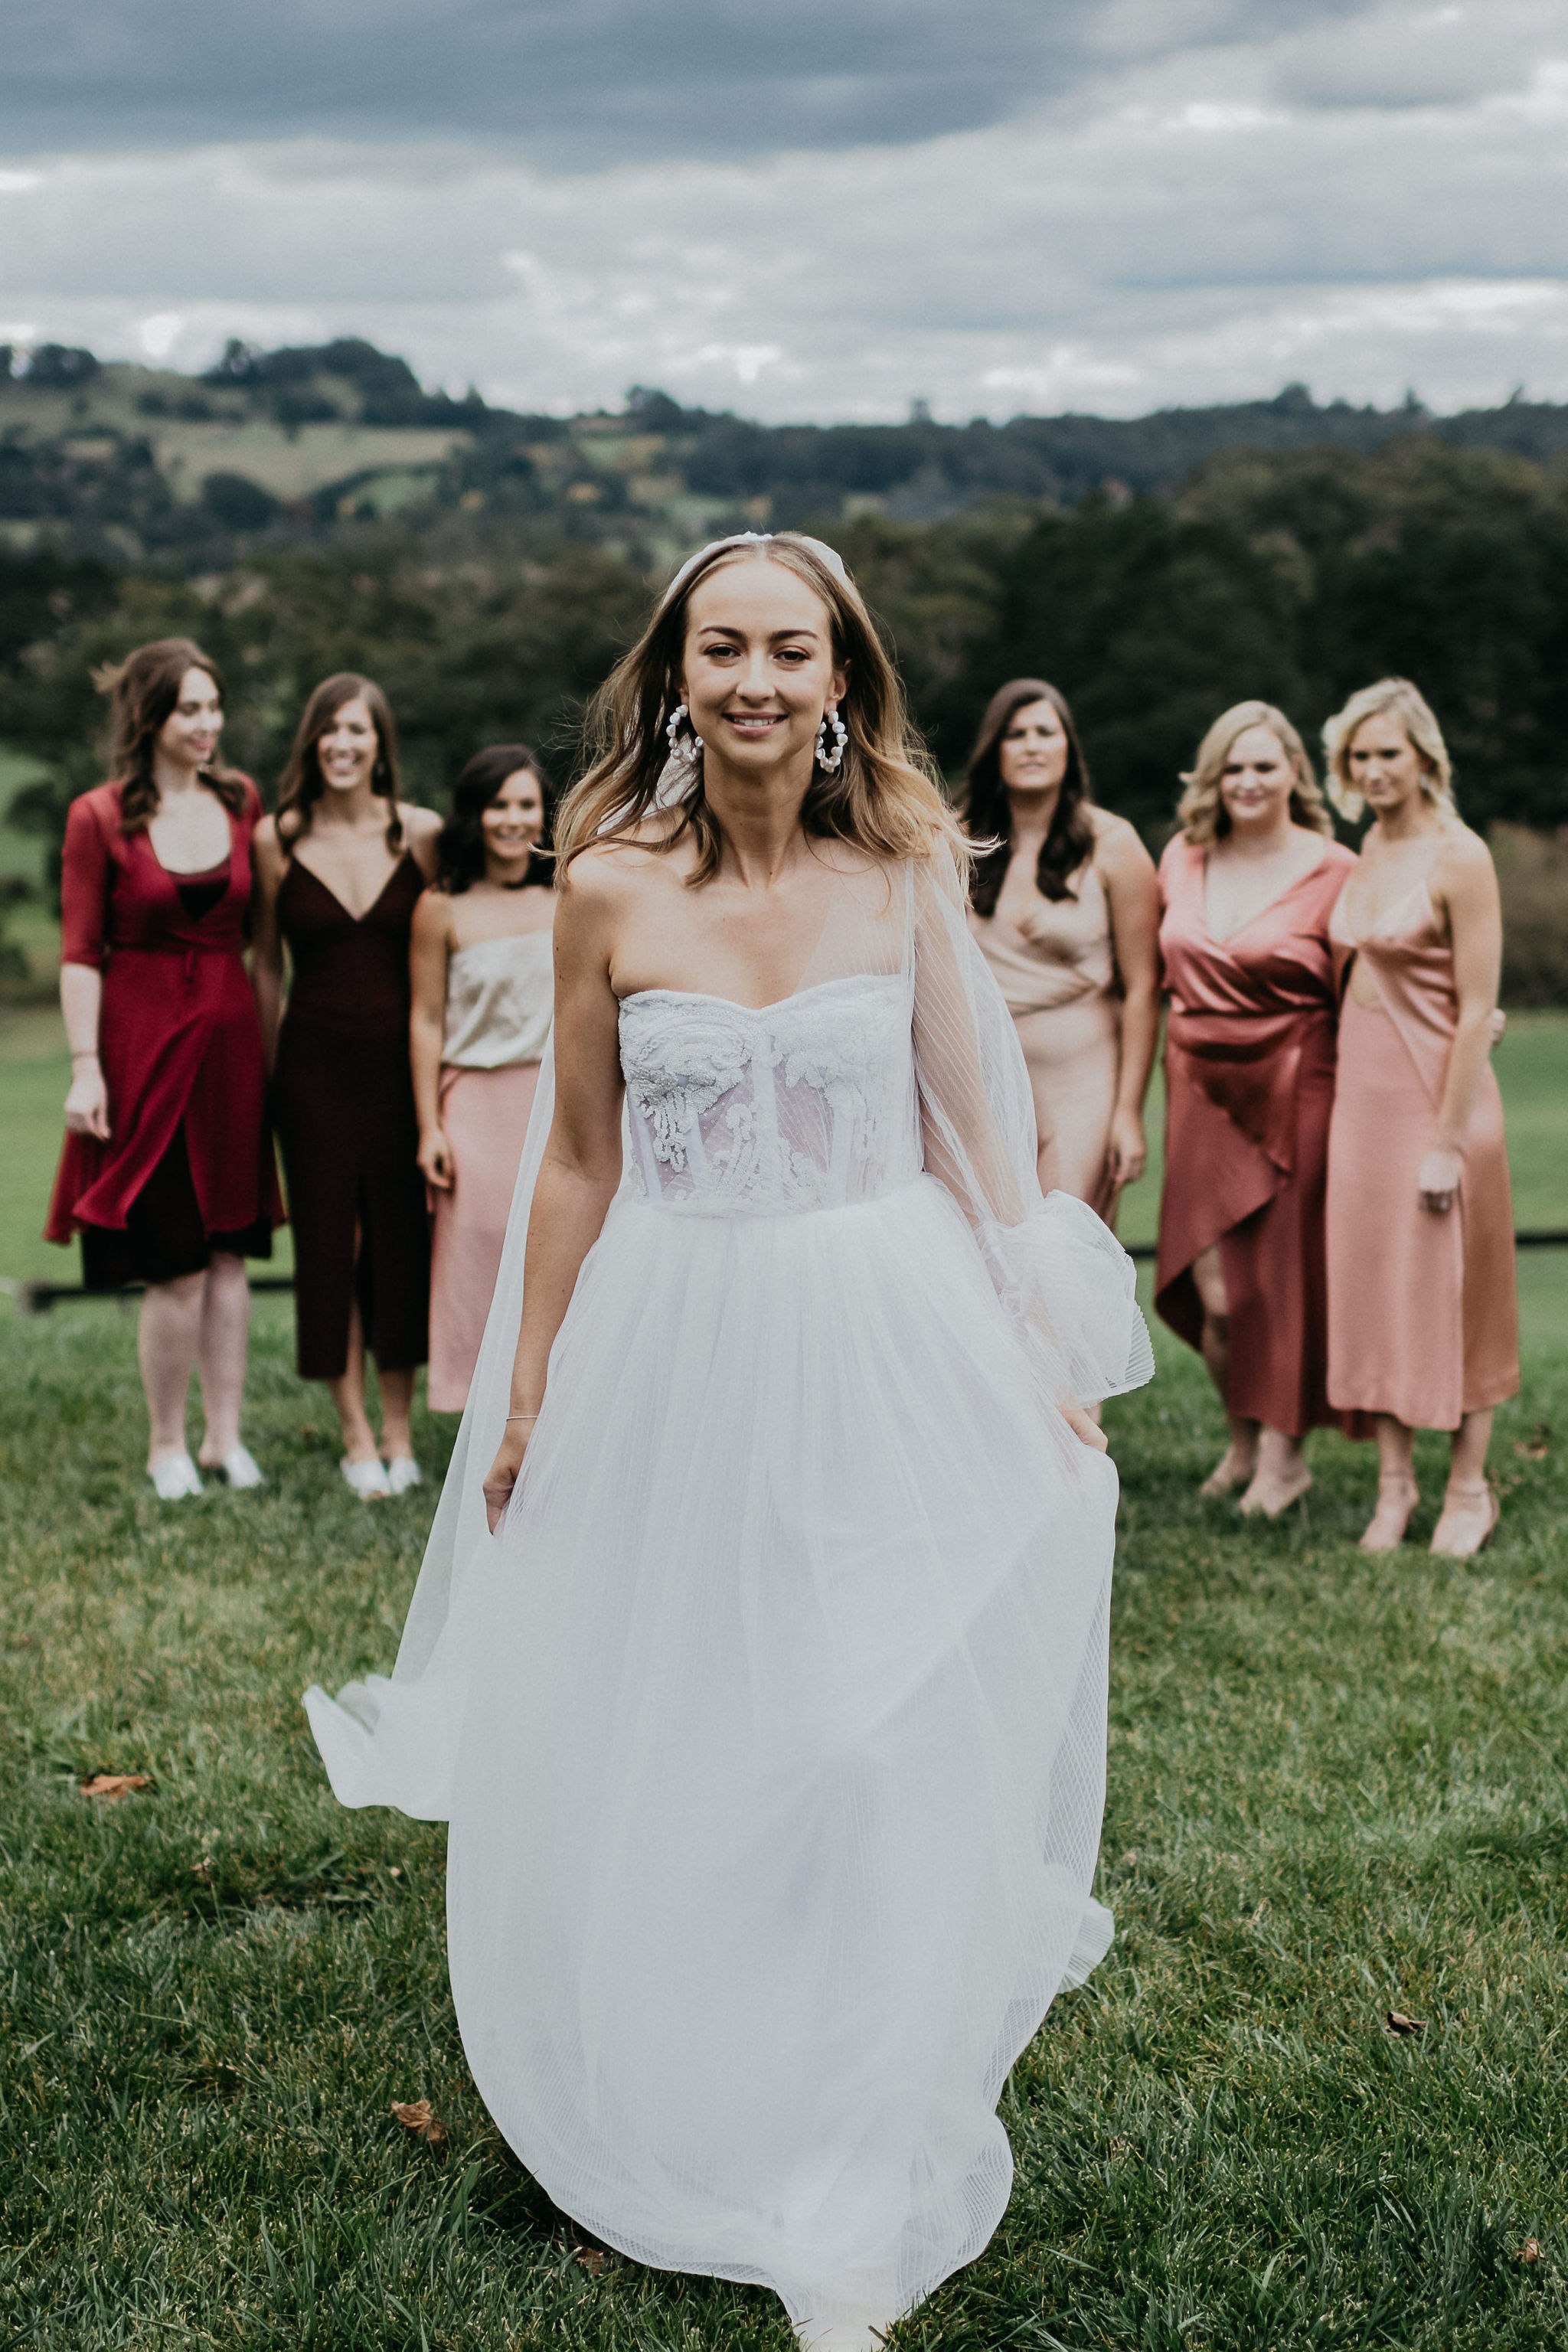 Christie Nicole Bridal Sarah Gown | Wedding dresses under $7,500 | LOVE FIND CO. Bridal Directory